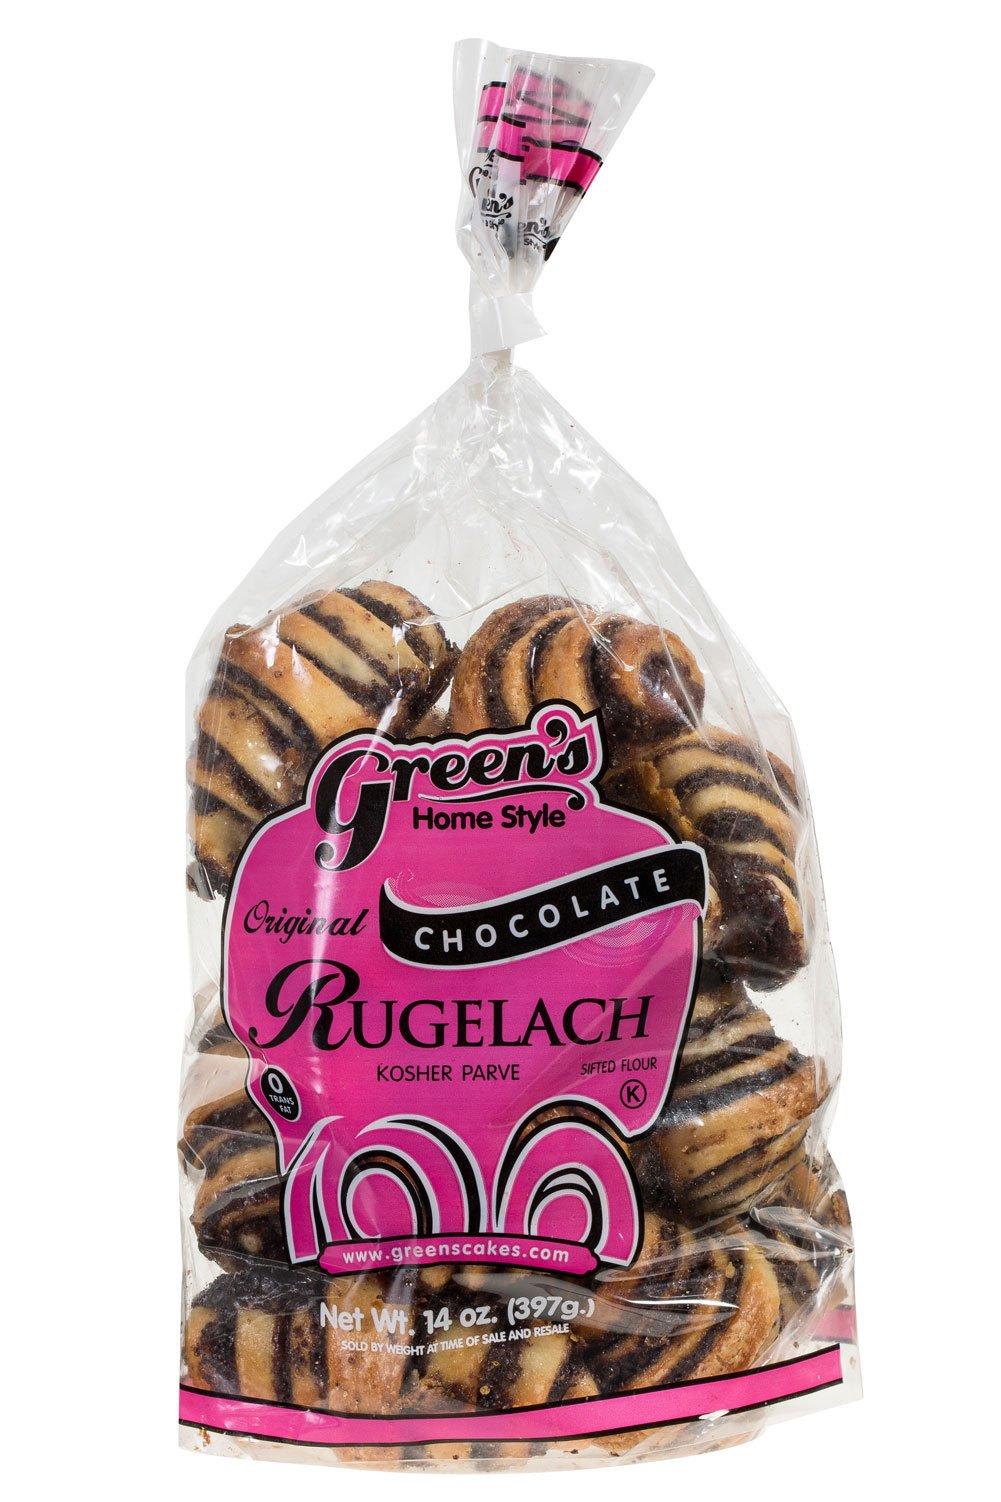 Green's Bakery Chocolate Rugelach Kosher Pastry - 14 oz.